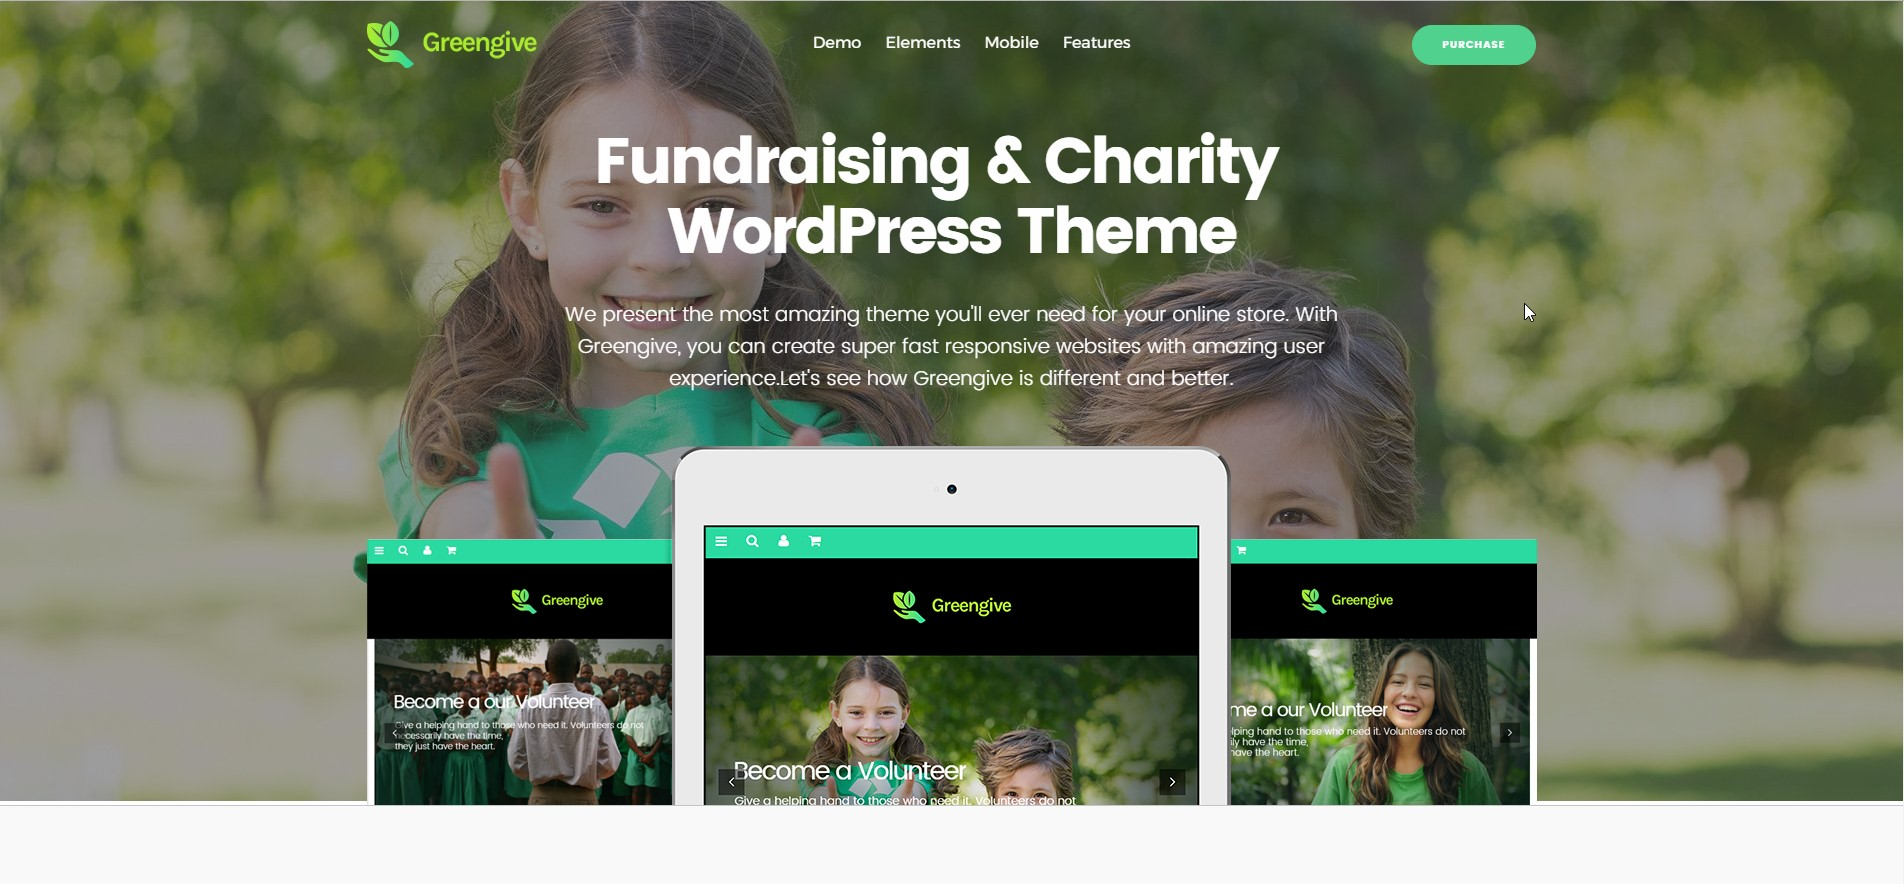 GreenGive - Fundraising WordPress Theme